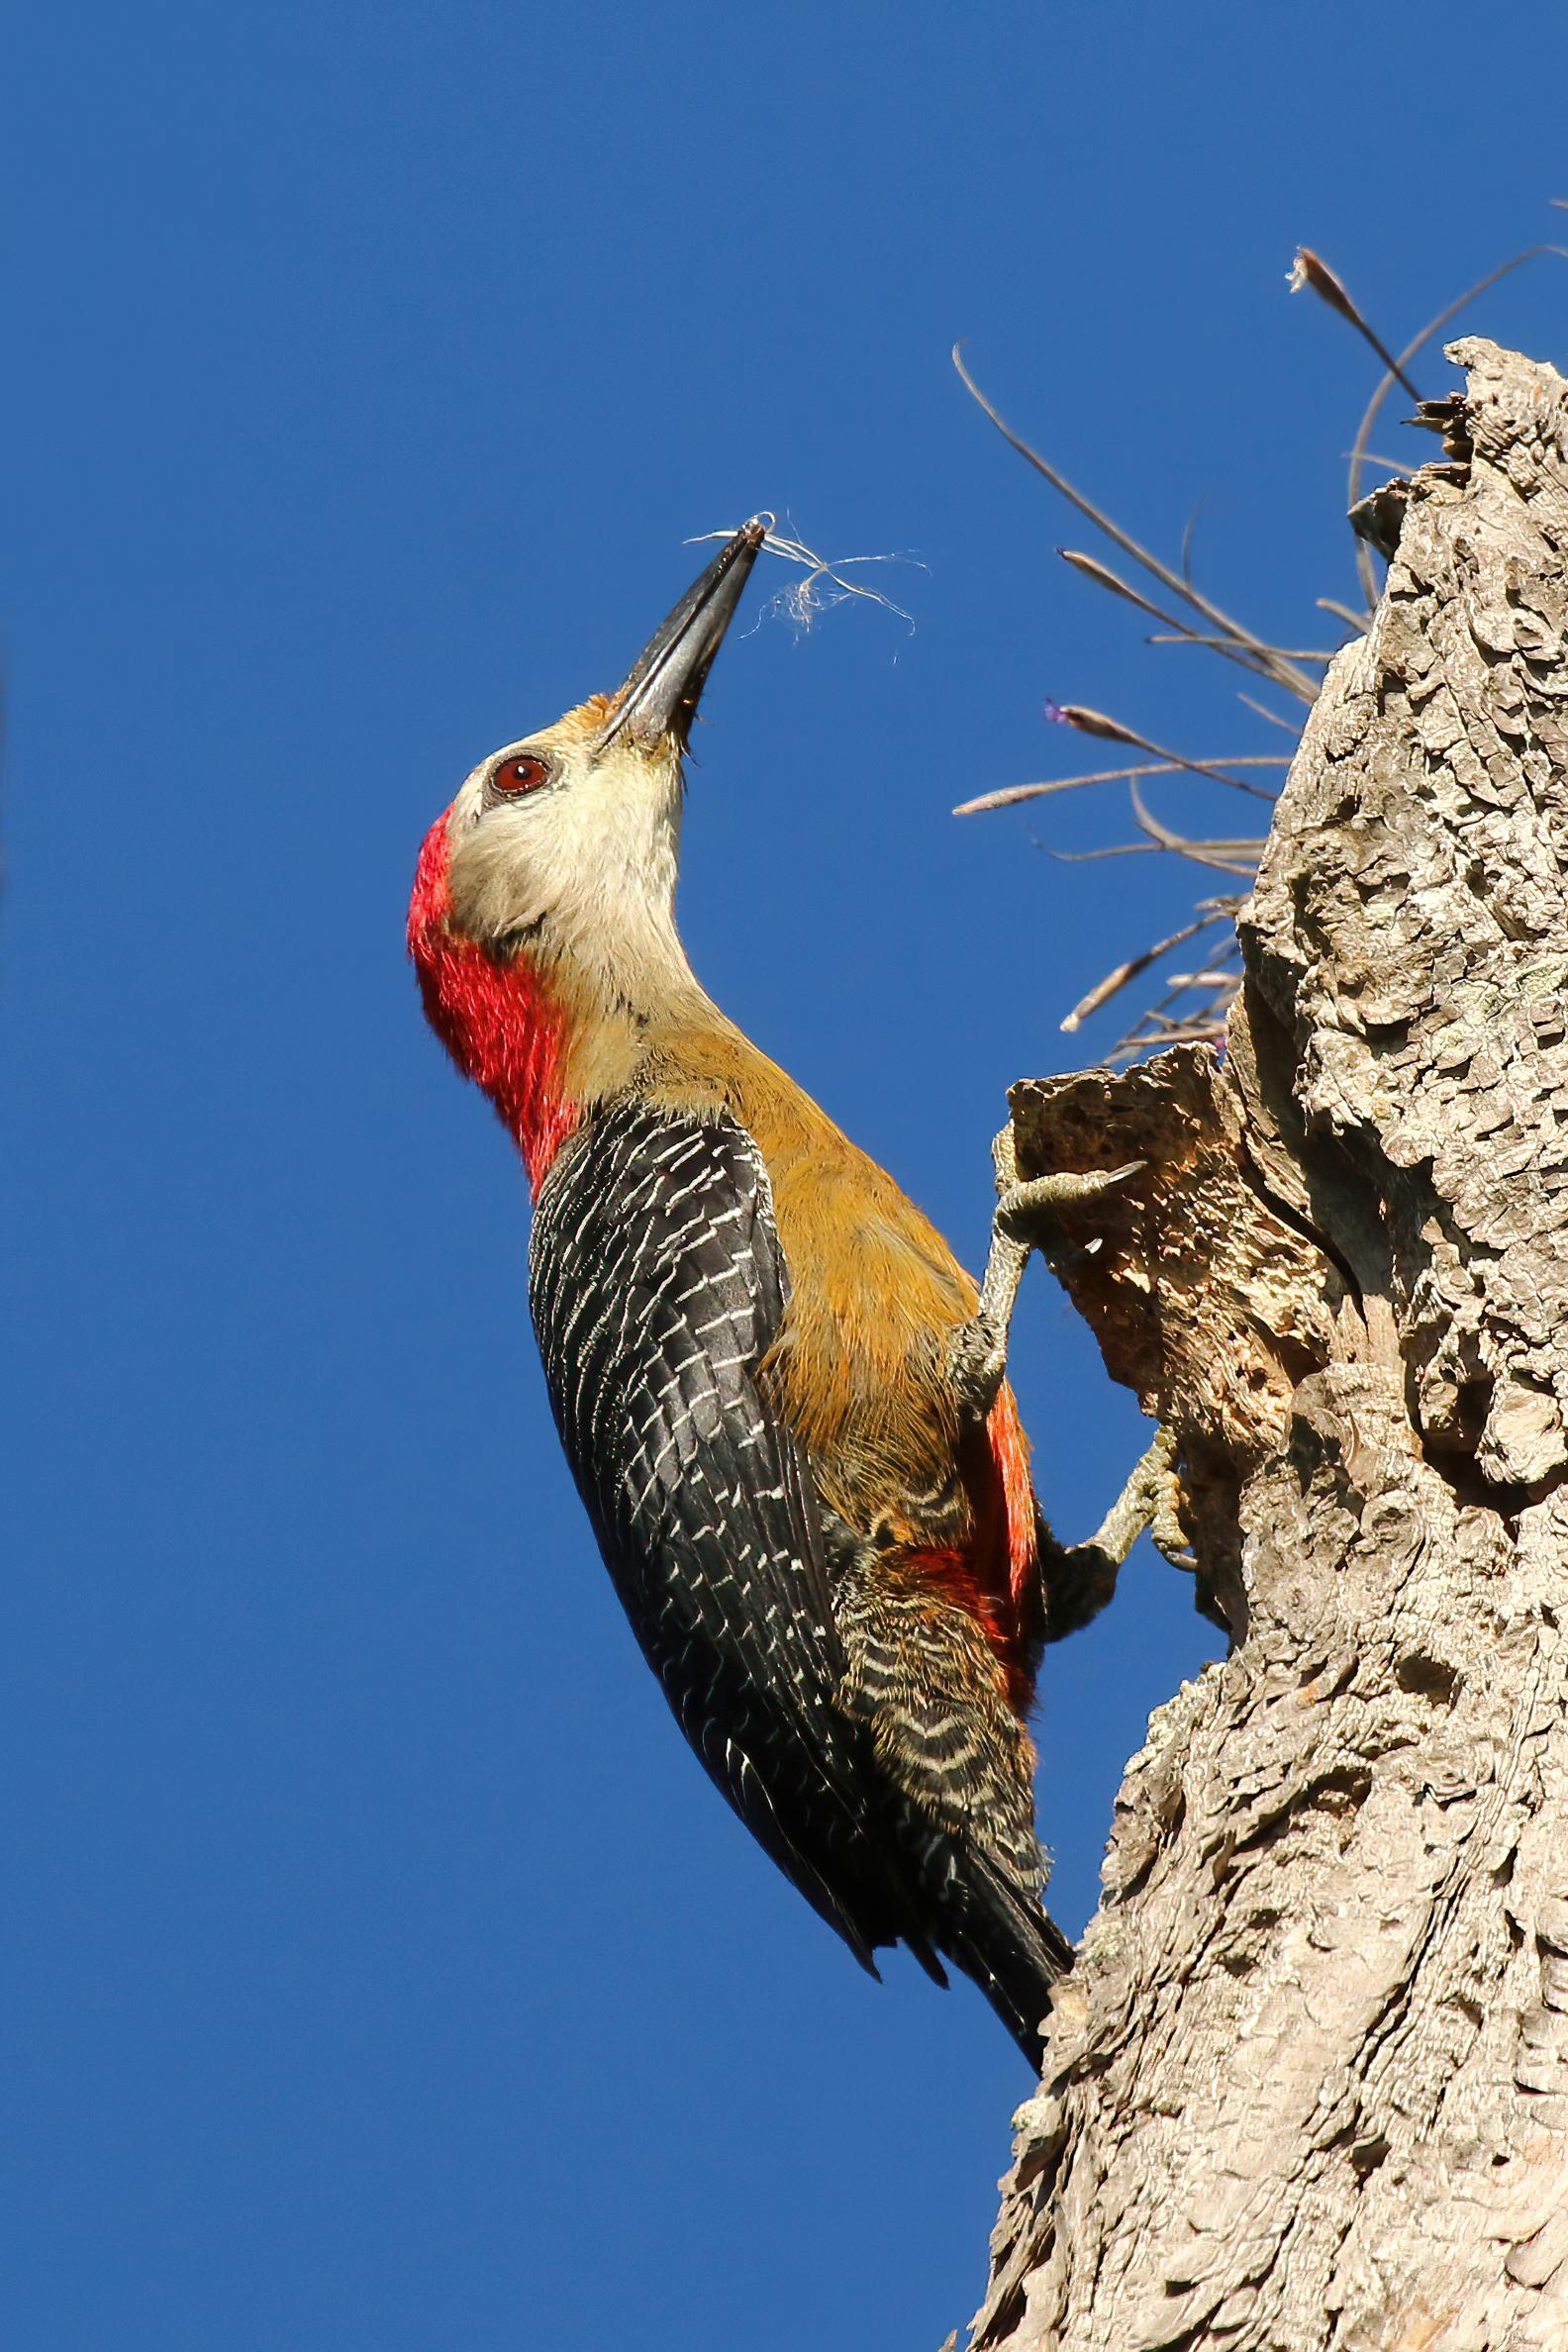 Jamaican_woodpecker_(Melanerpes_radiolat